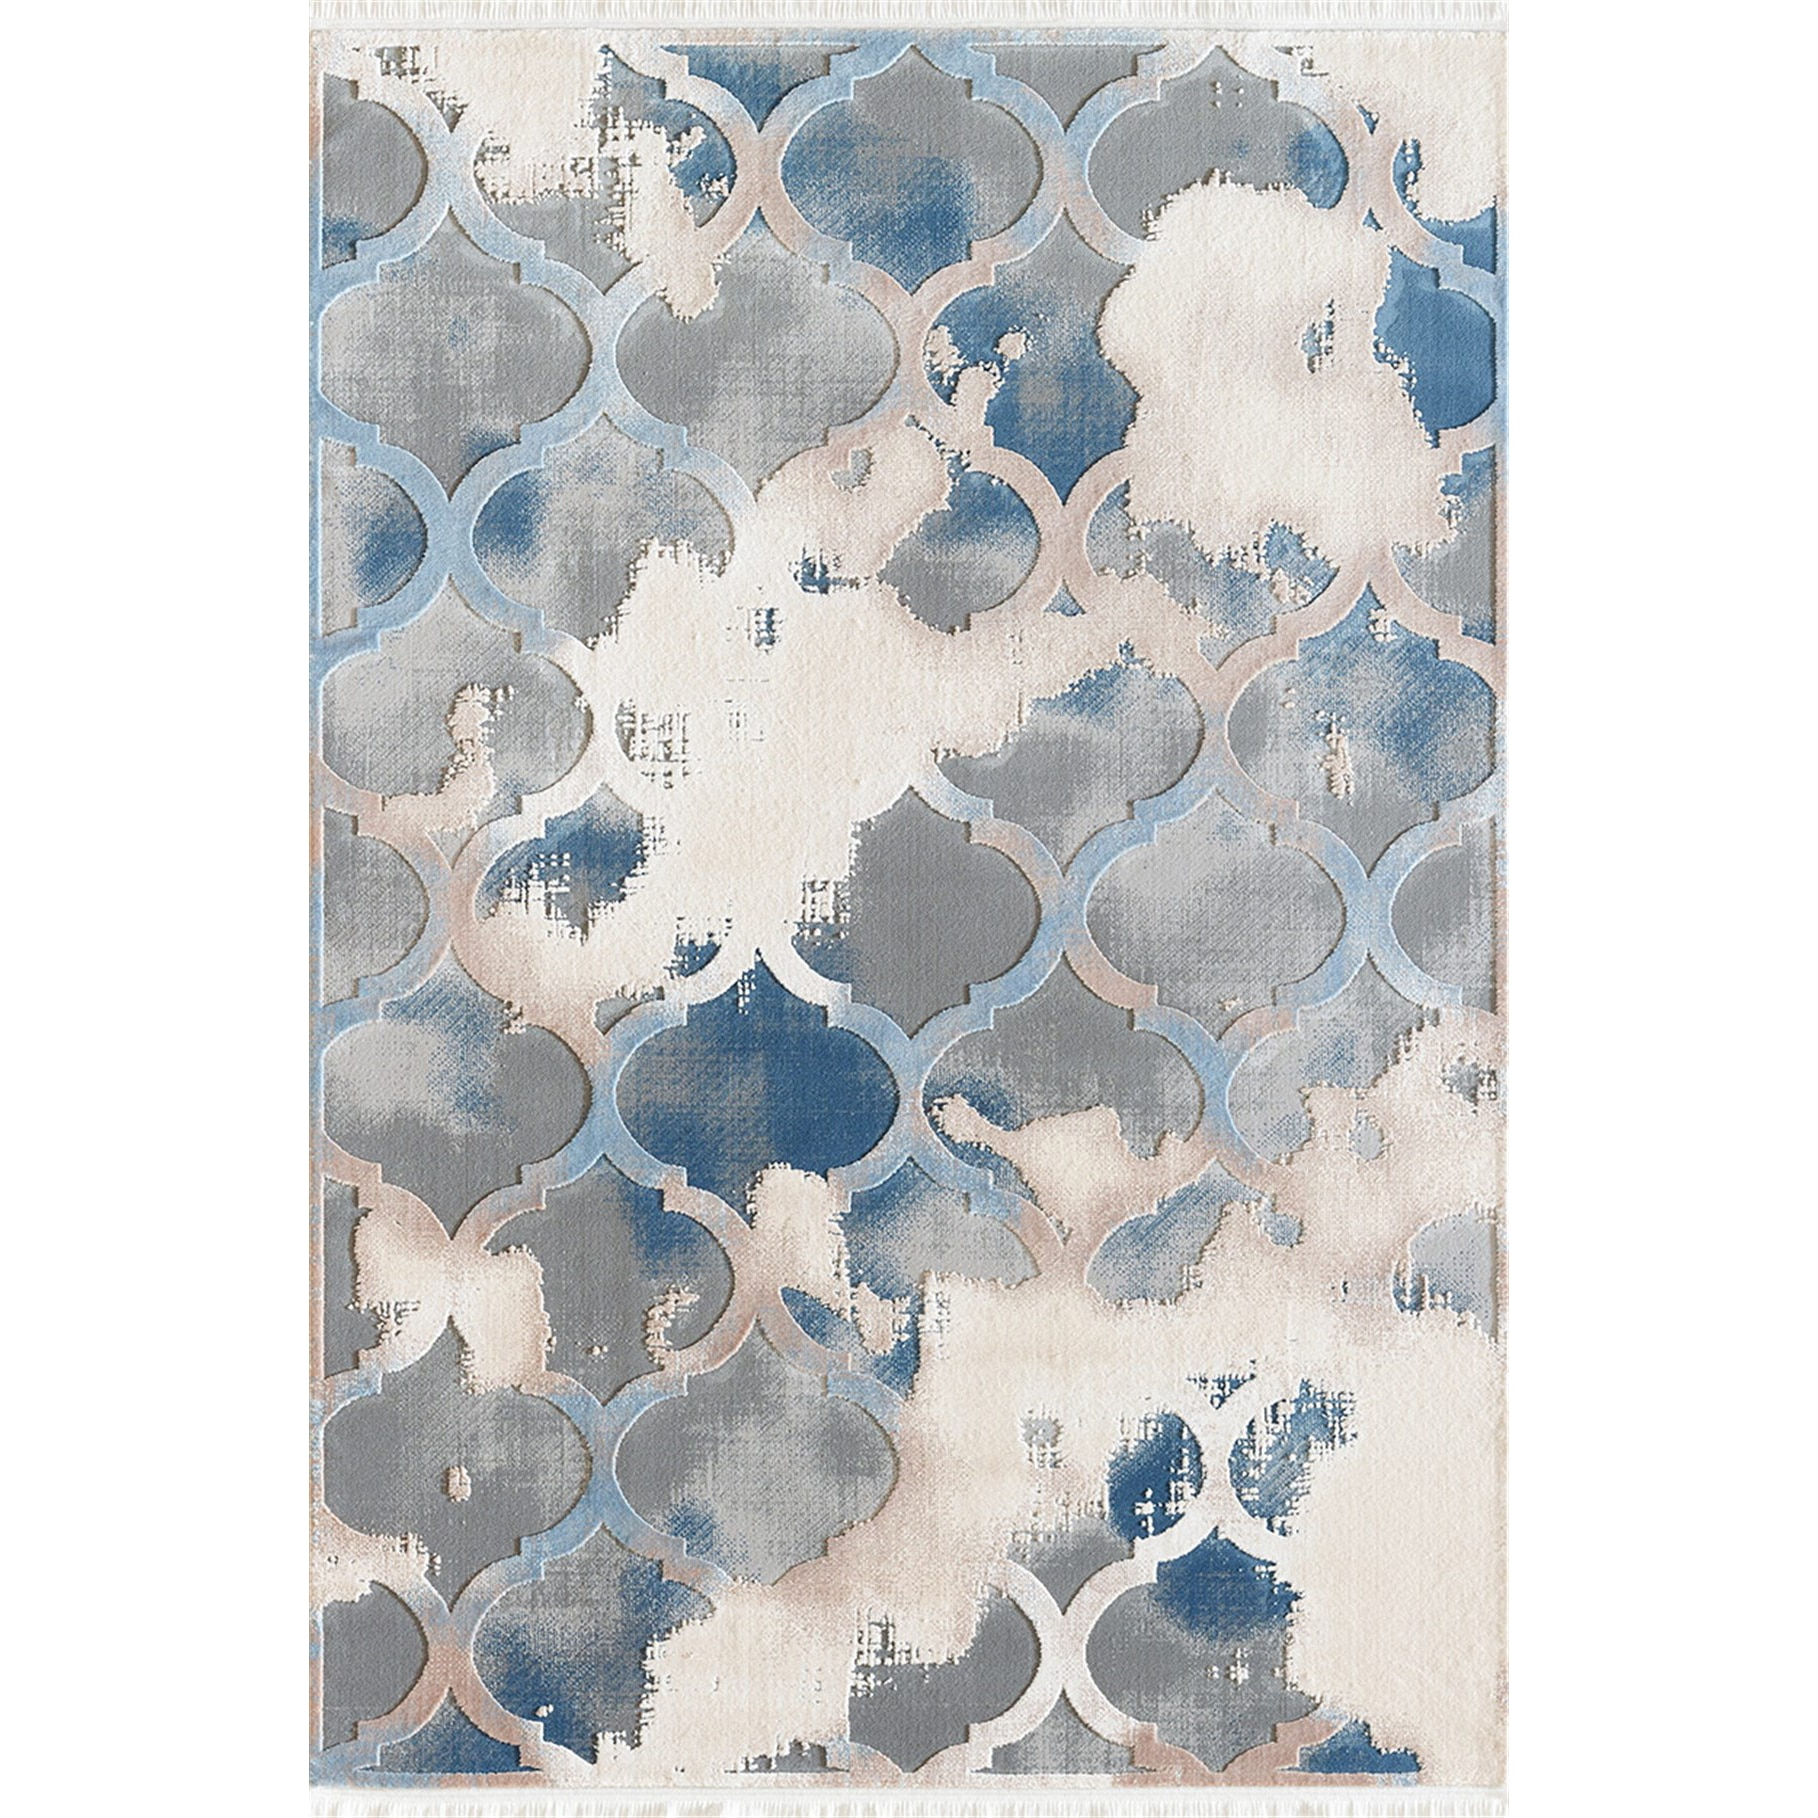 Fotografie Covor Girit Pierre Cardin, antistatic, acrilic, 80x150 cm, albastru/crem, GR03C